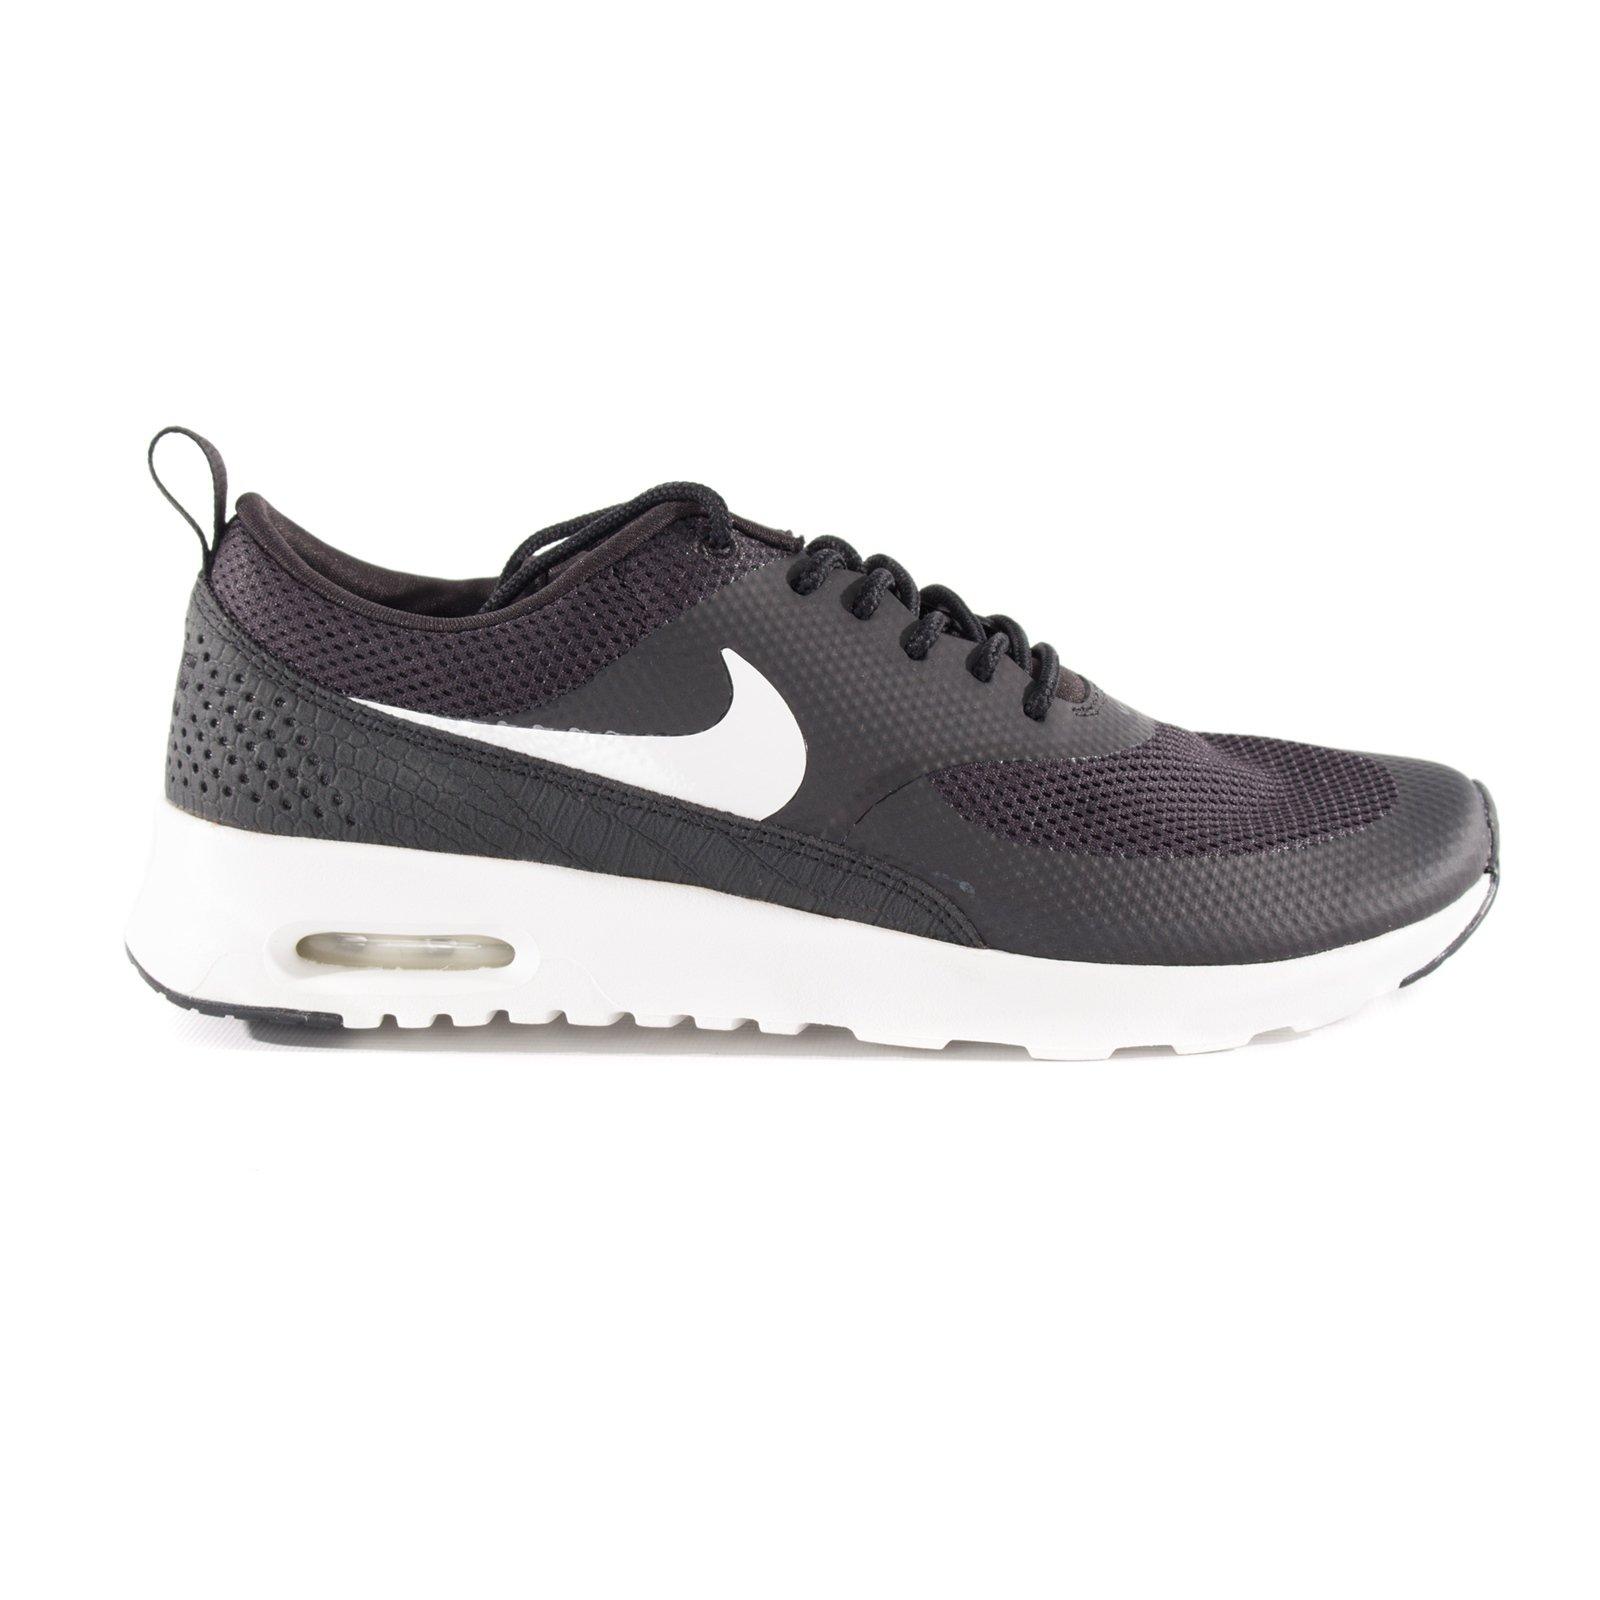 NIKE Air Max Thea Women Sneakers BlackAnthraciteWhiteWolf Grey 599409 007 (Size: 7.5)